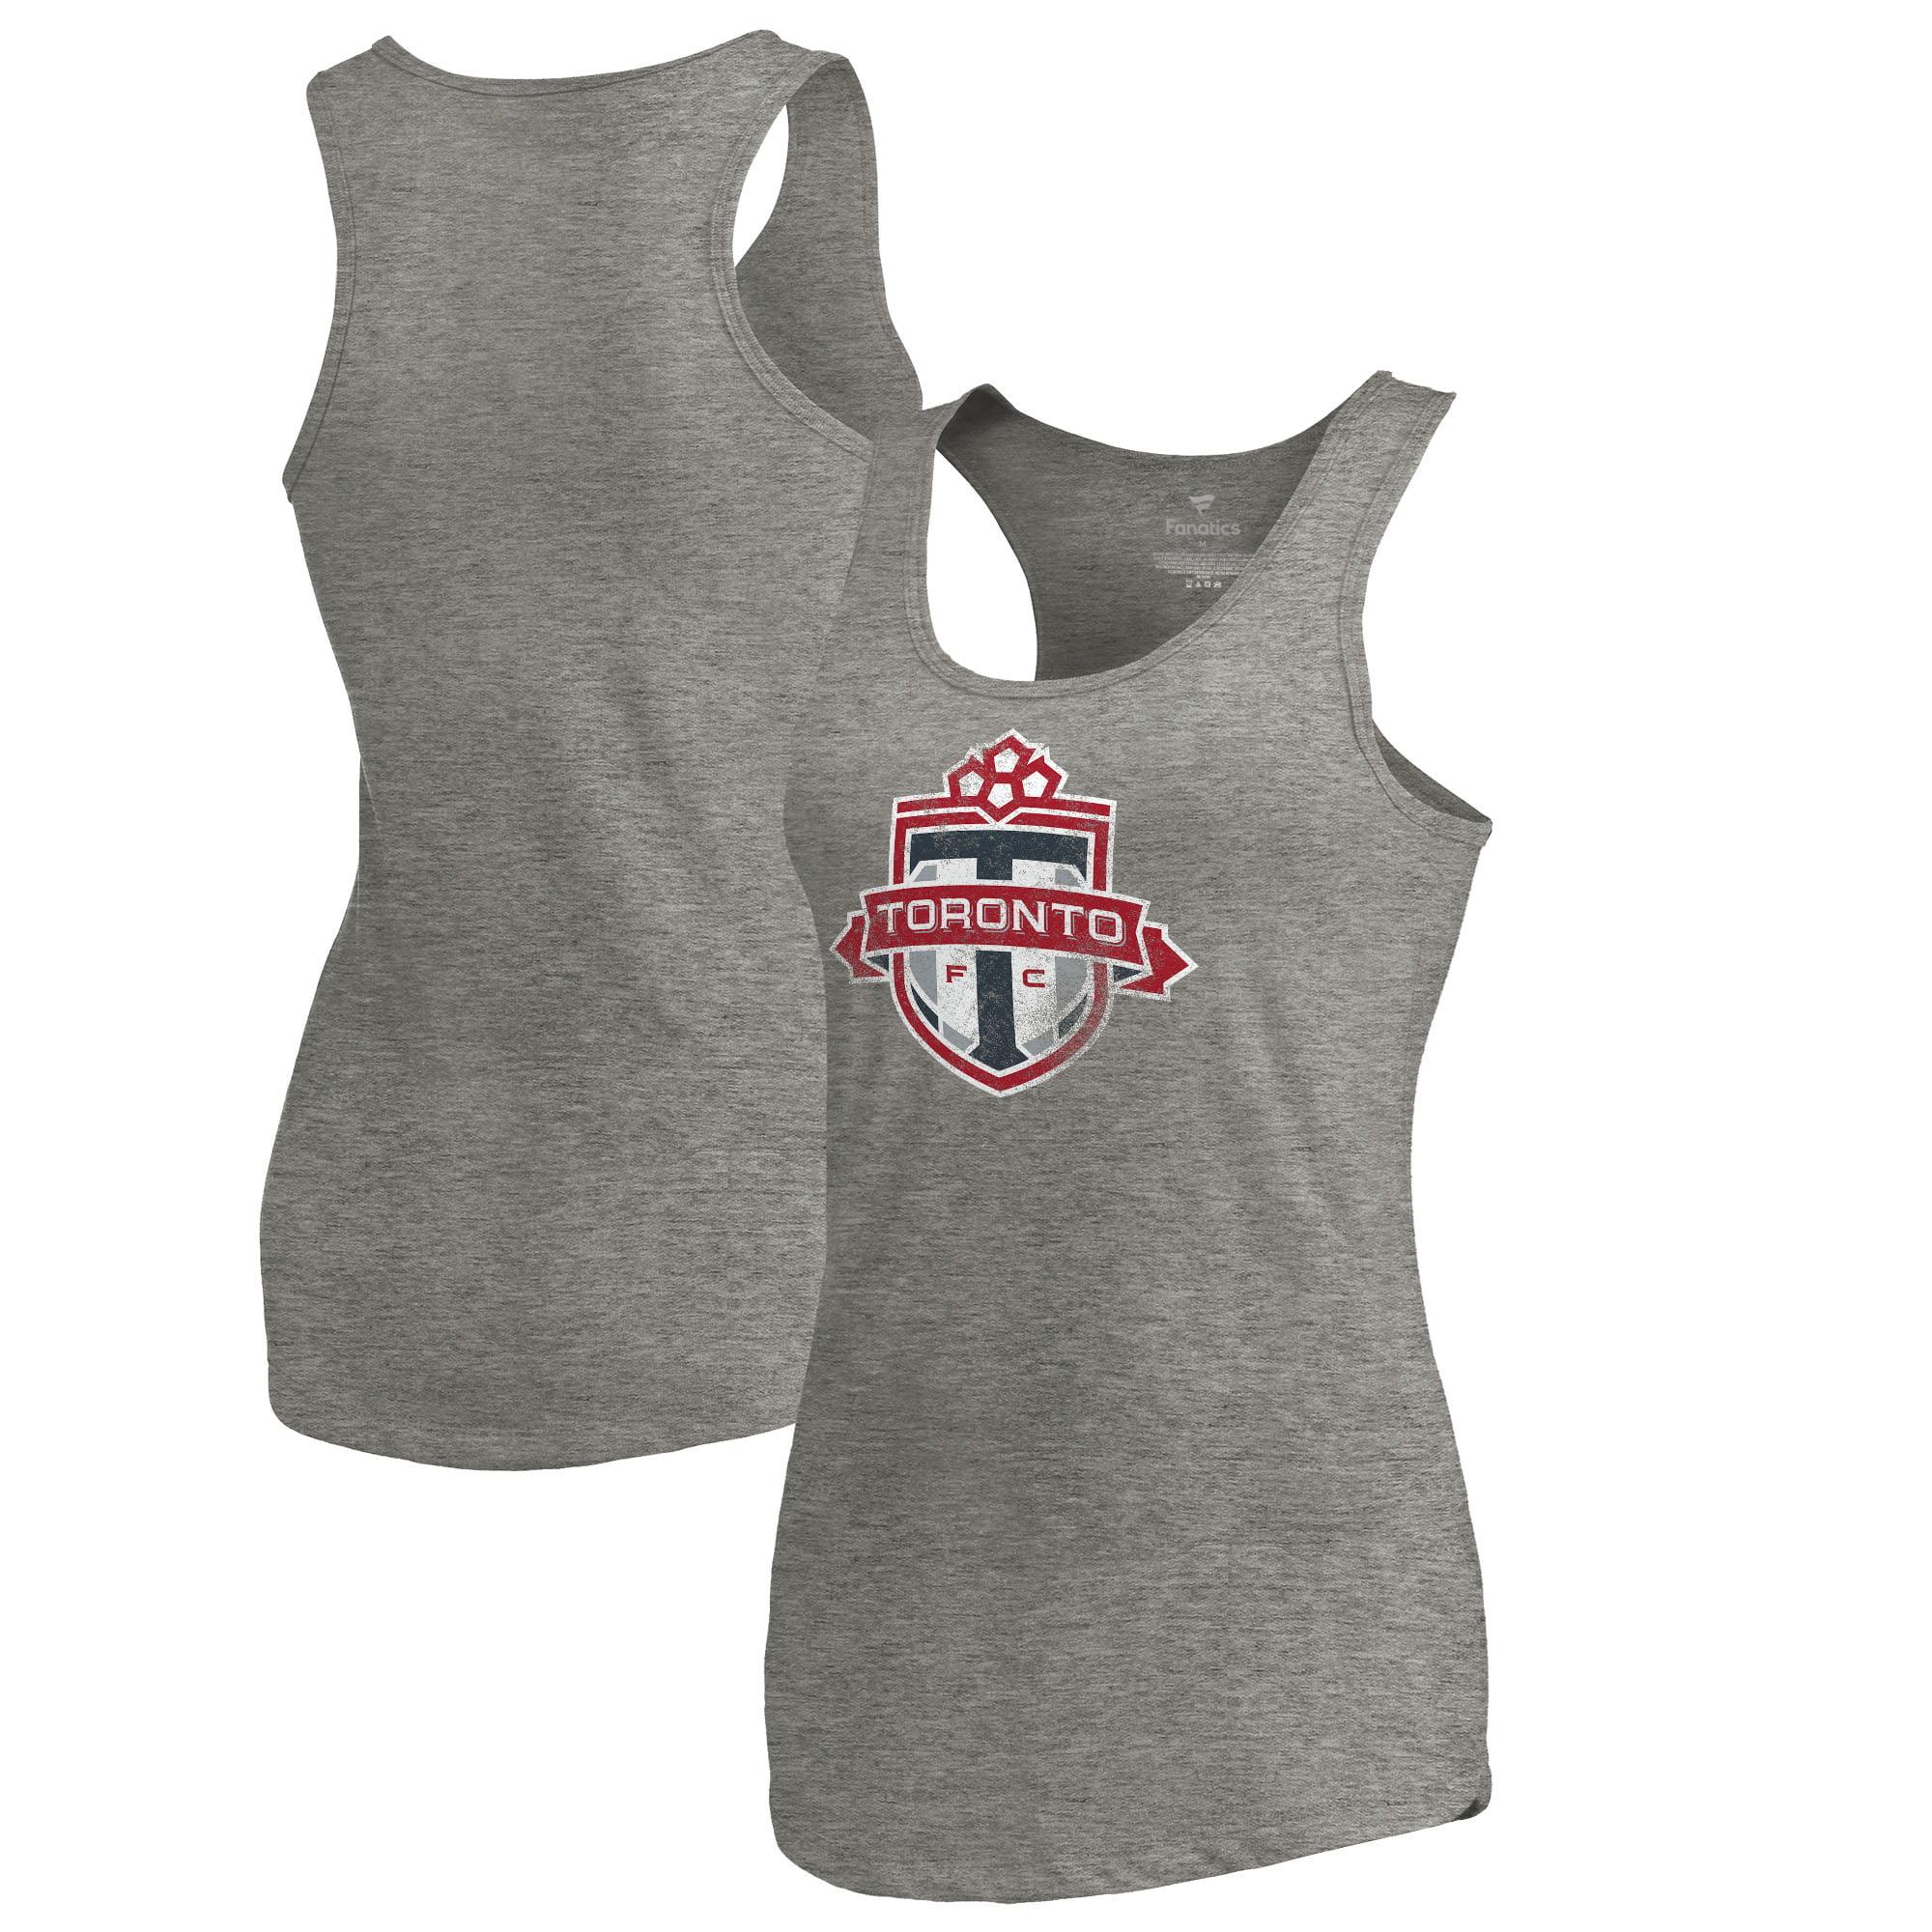 Toronto FC Fanatics Branded Women's Distressed Primary Logo Tri-Blend Tank Top - Heathered Gray